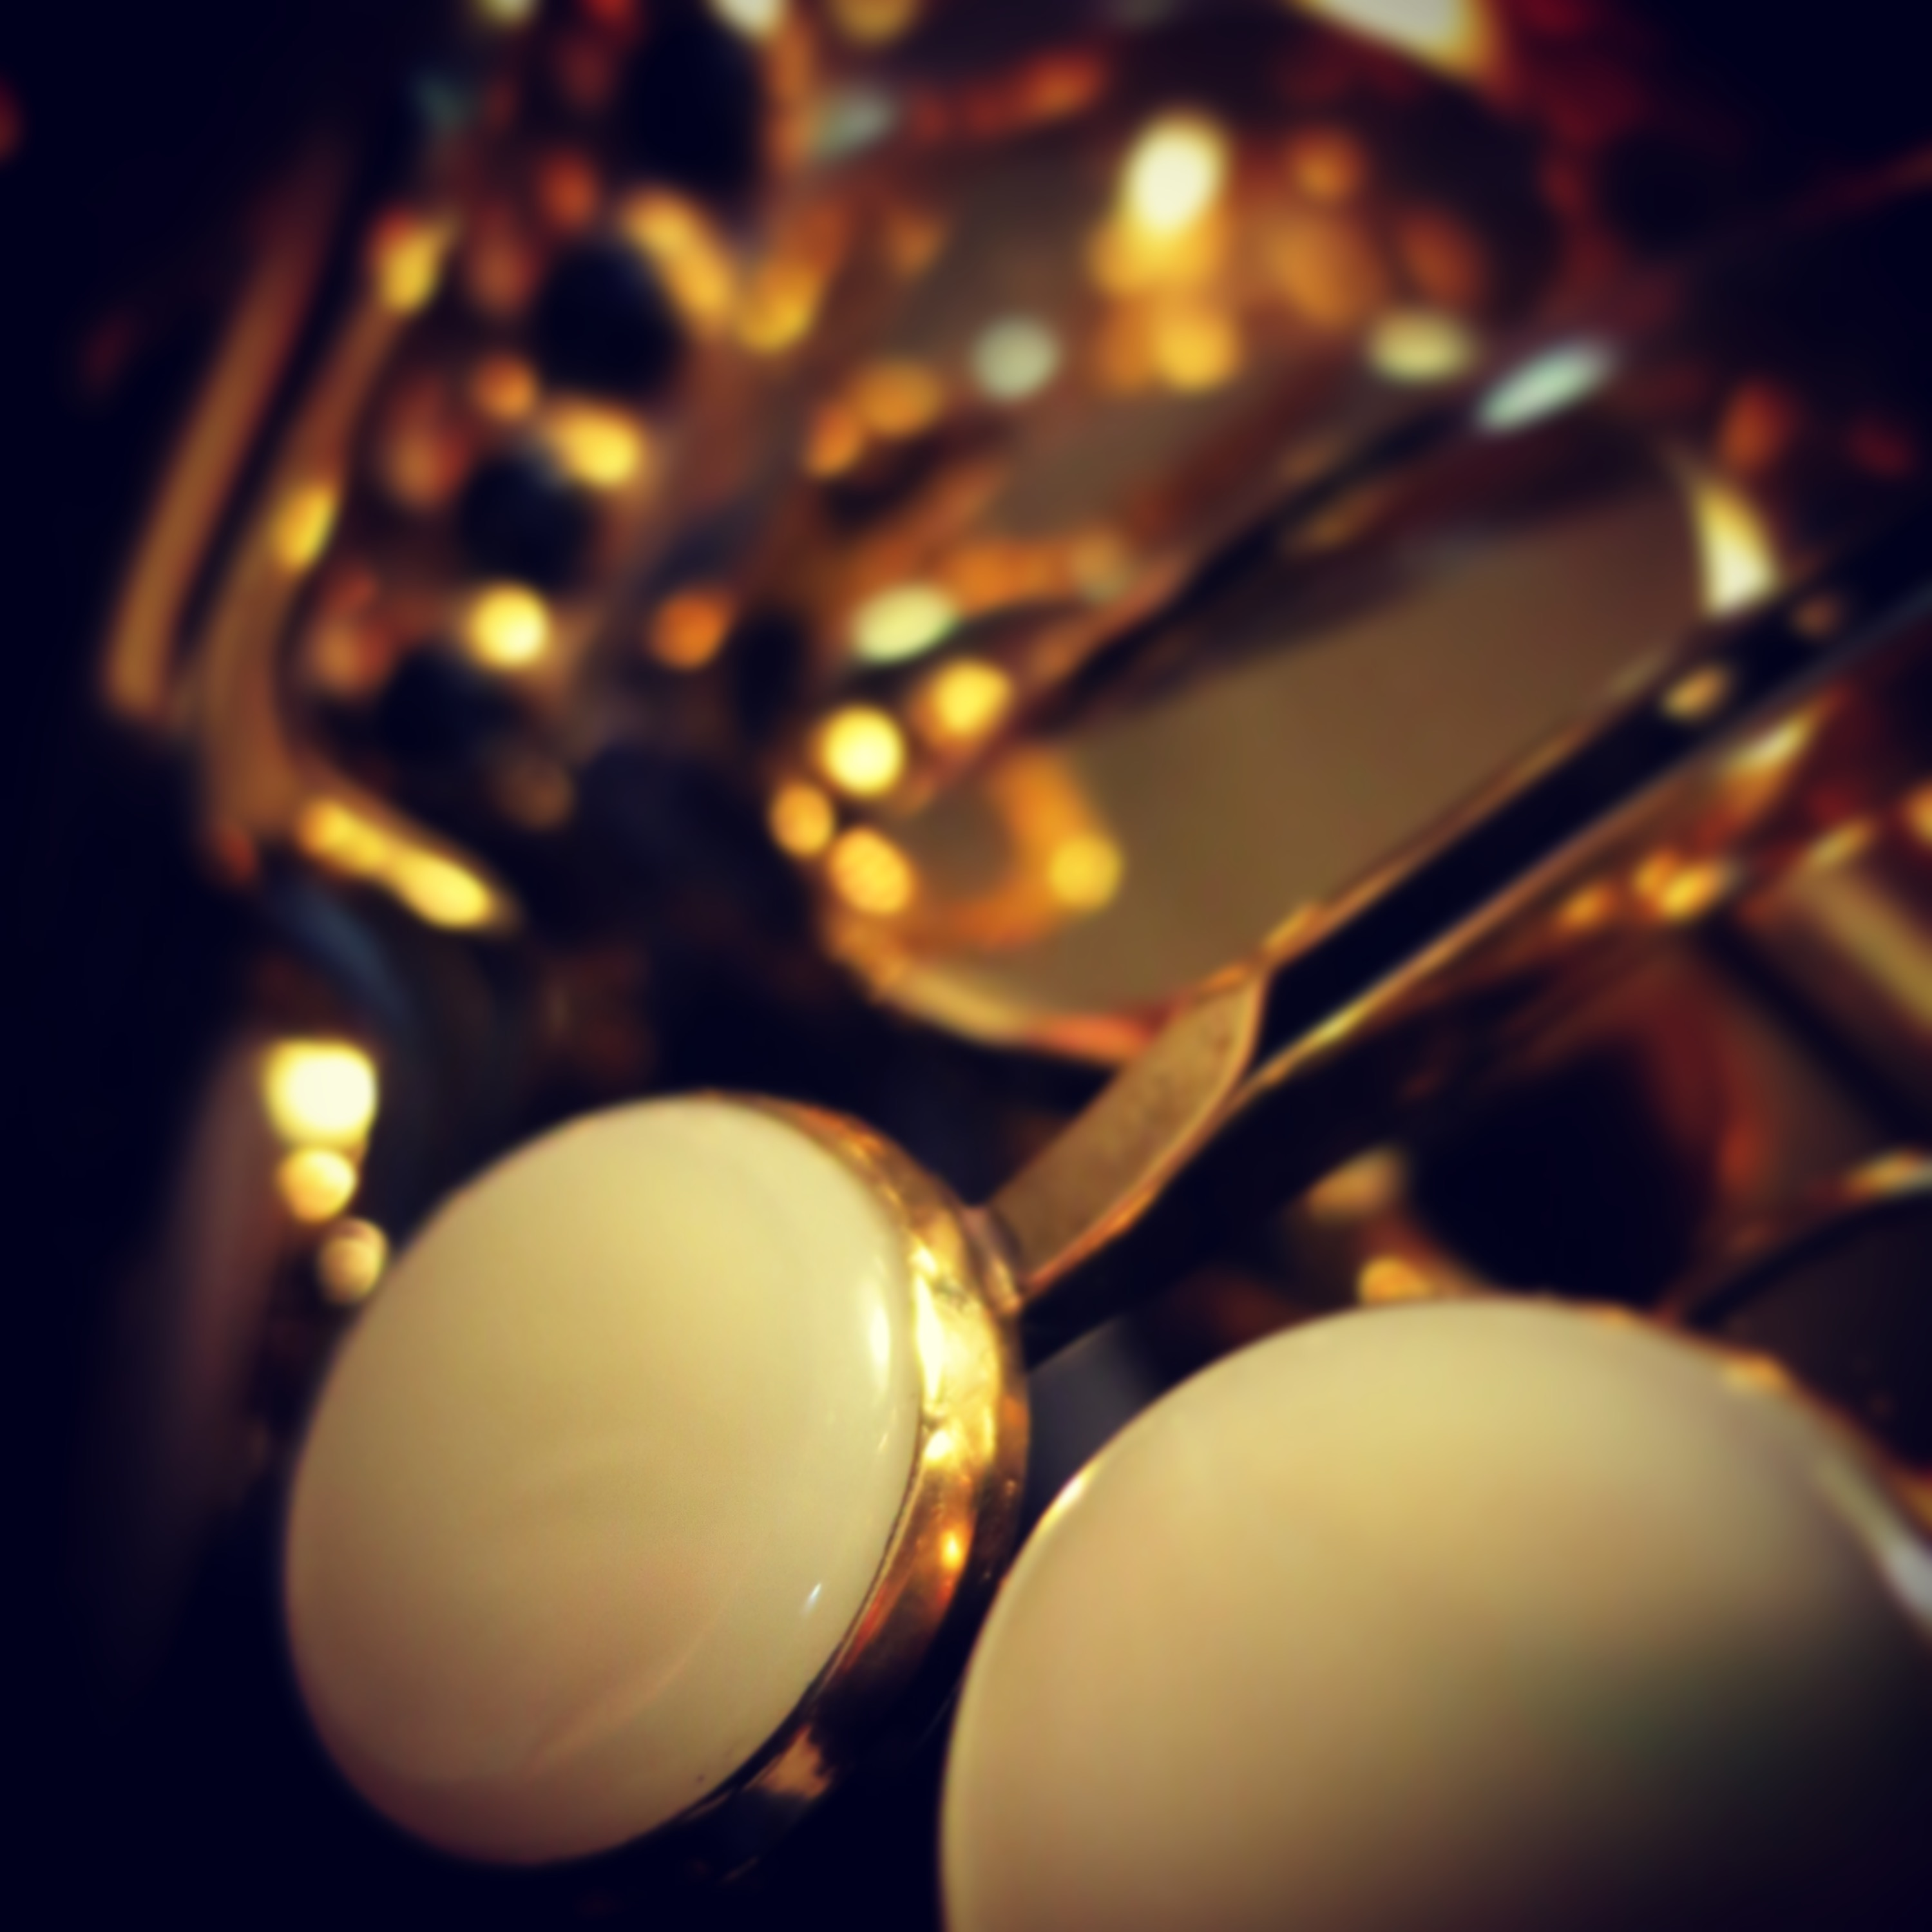 Closeup No.2